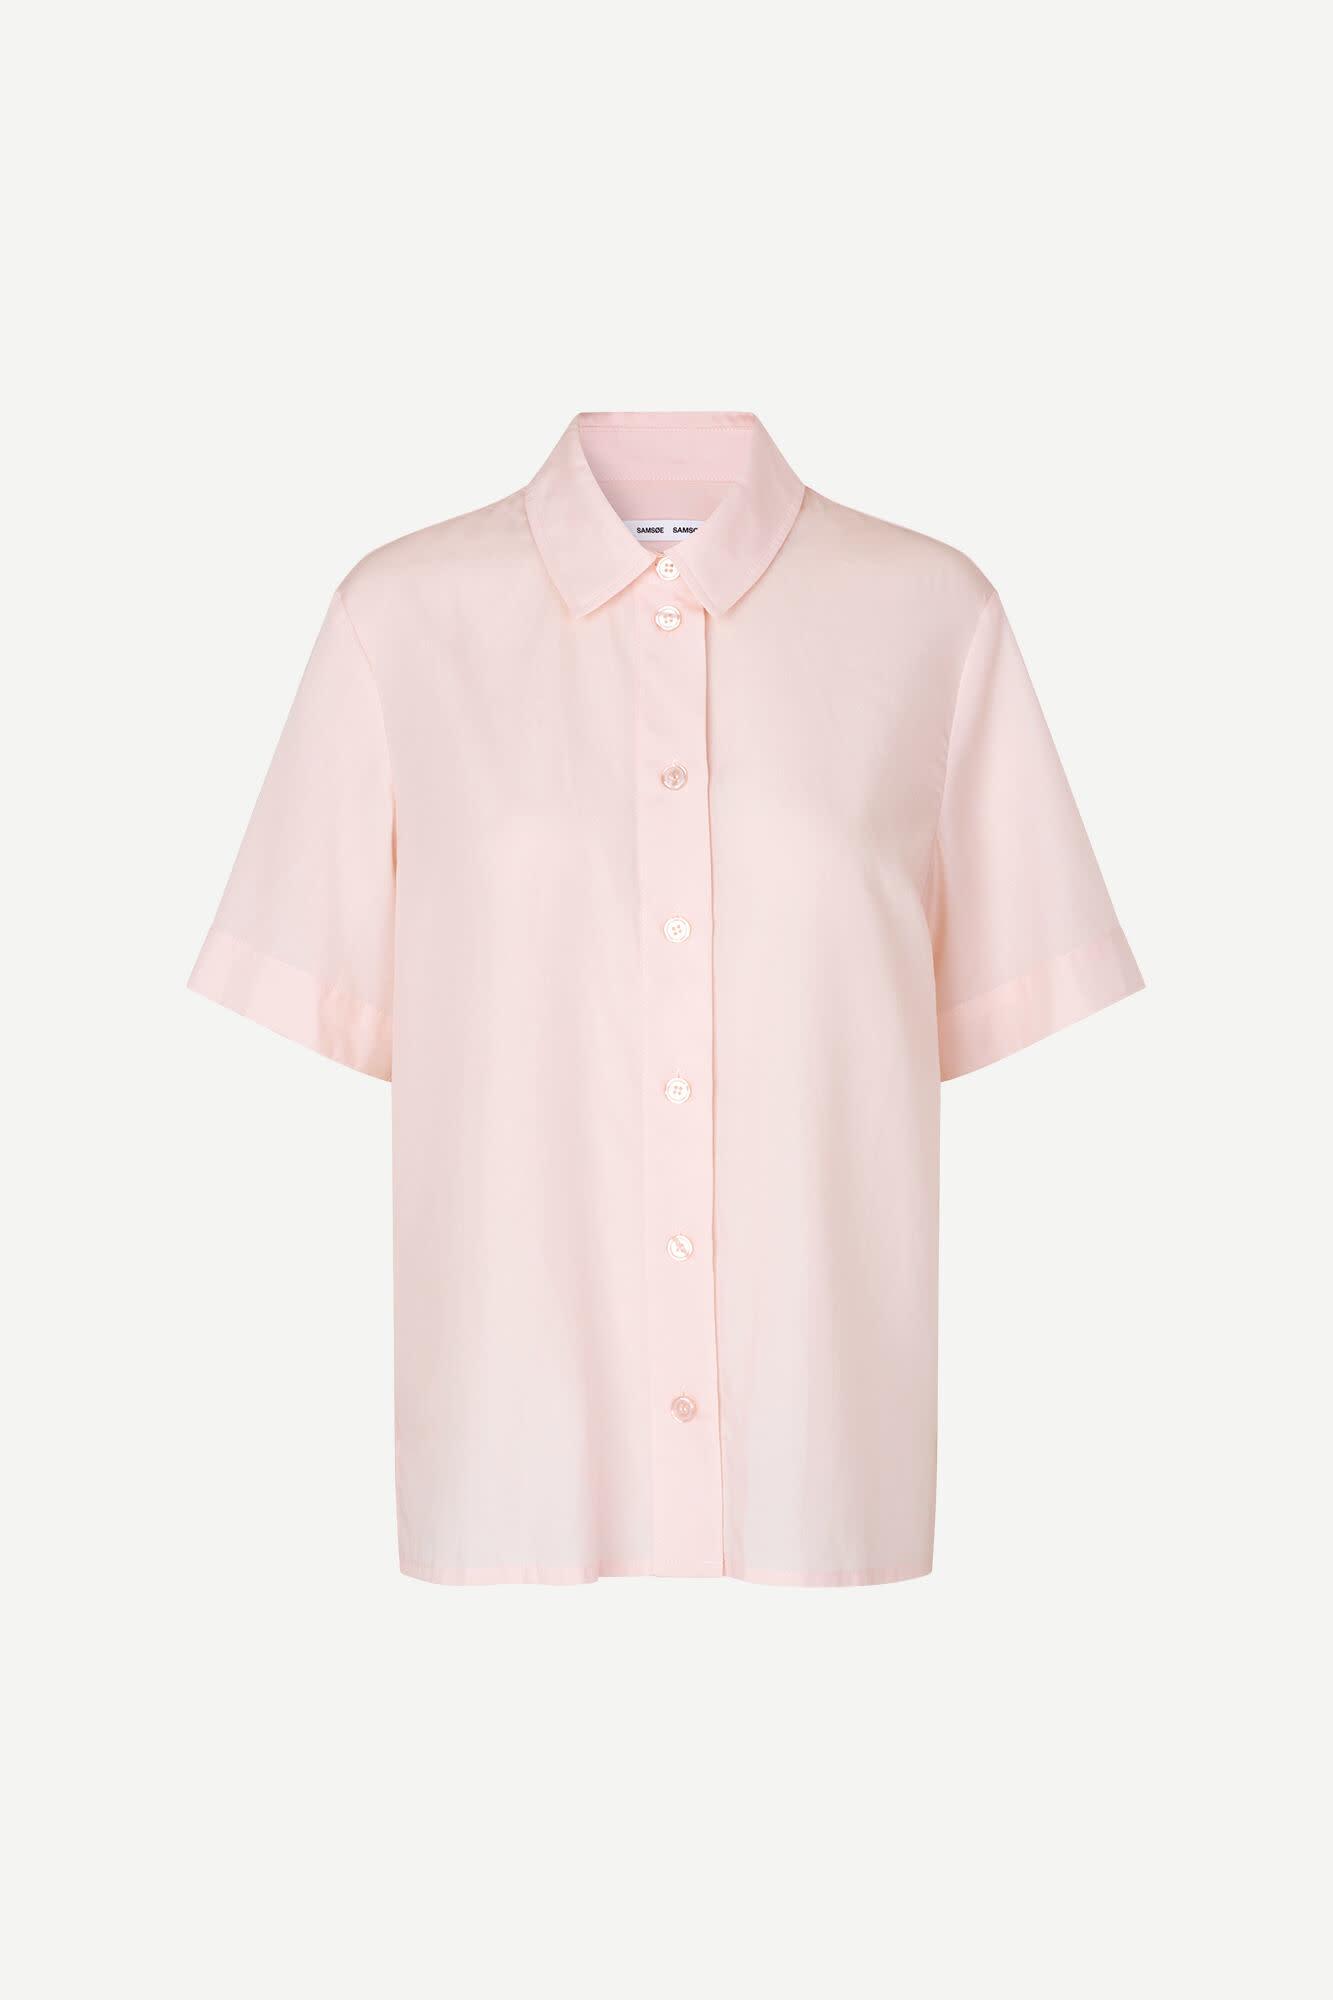 Overhemd met korte mouwen Bansa Crystal Pink 10554-1